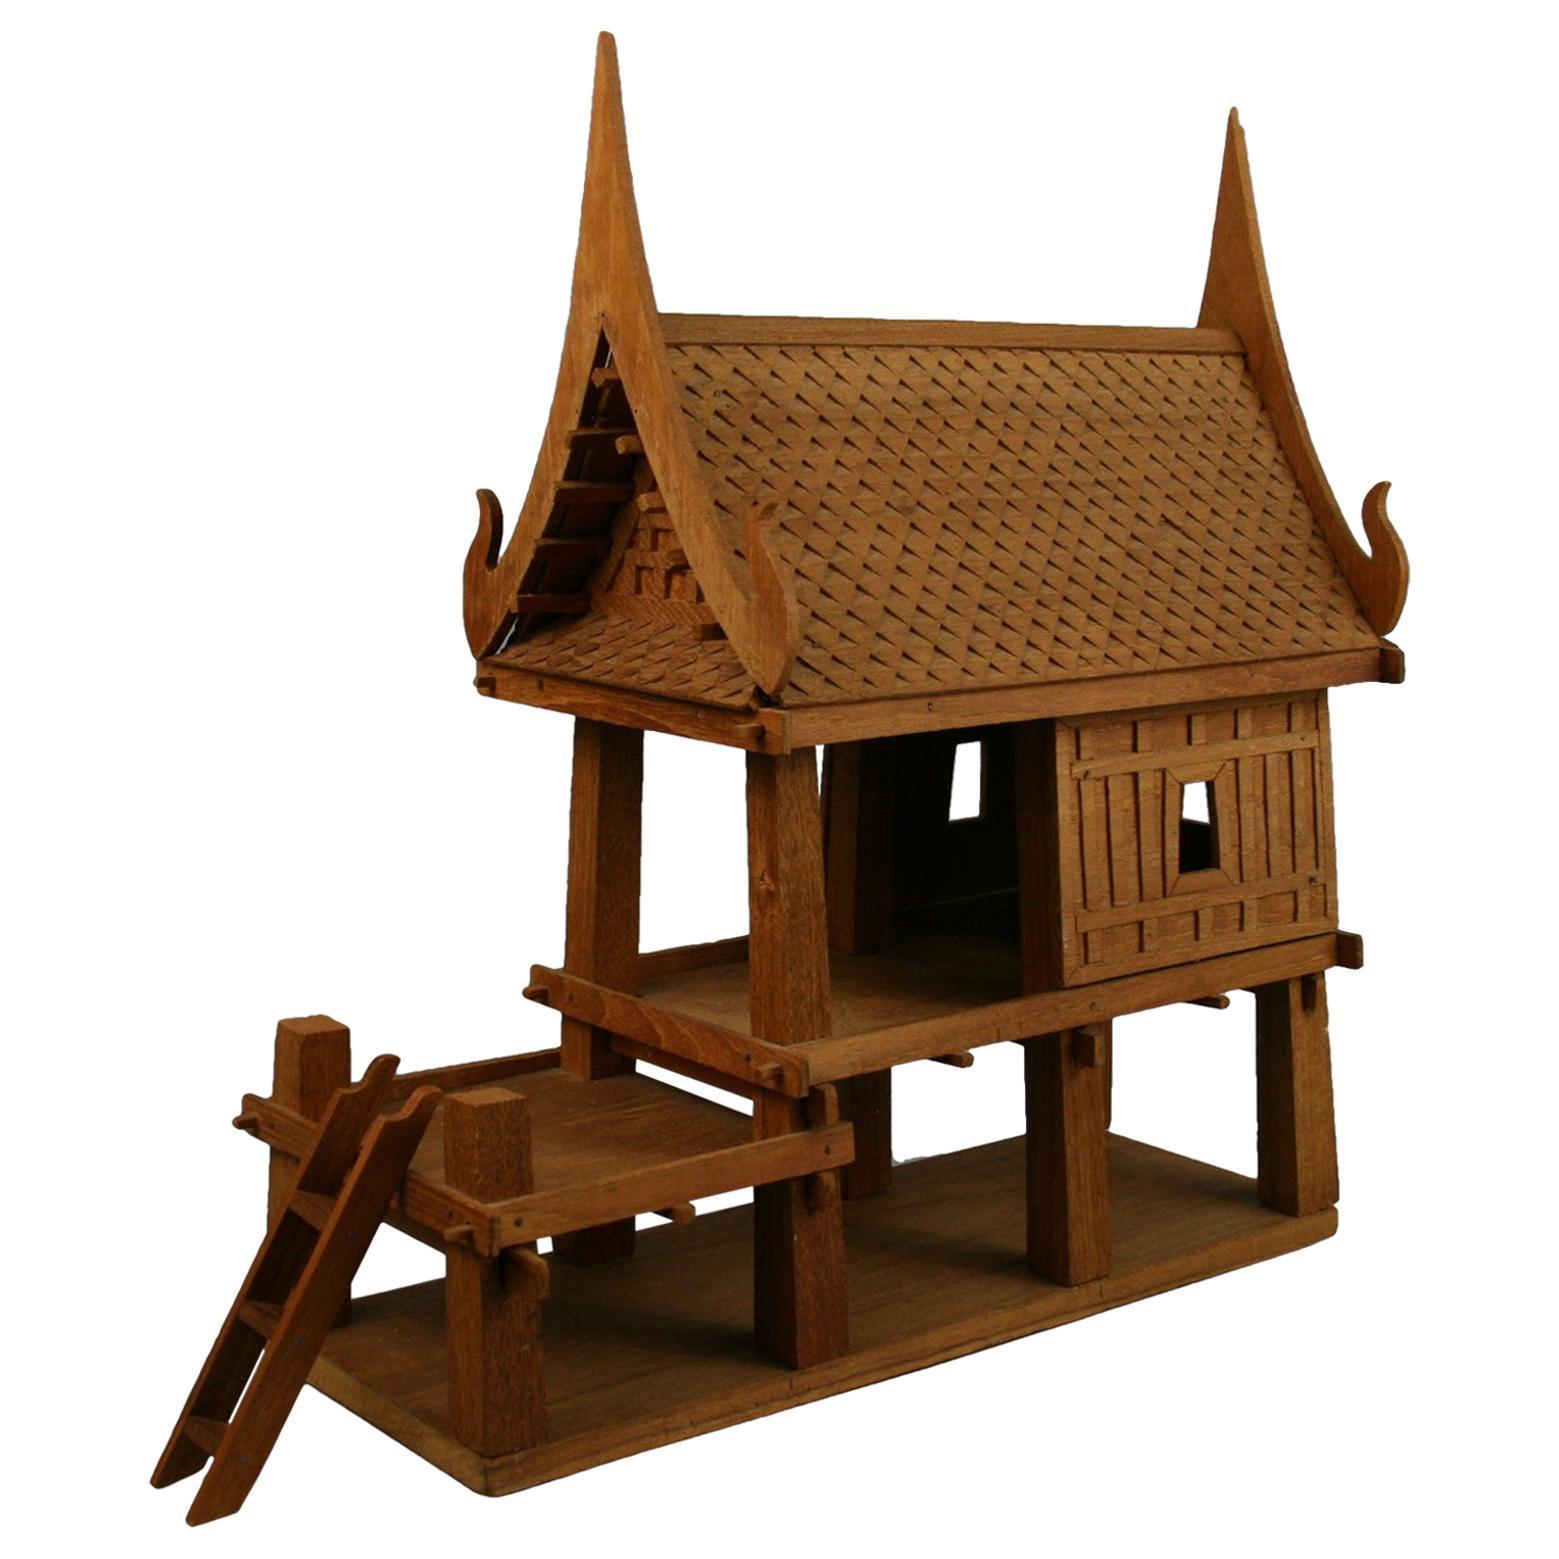 Northern Thailand Teak Wood House Model